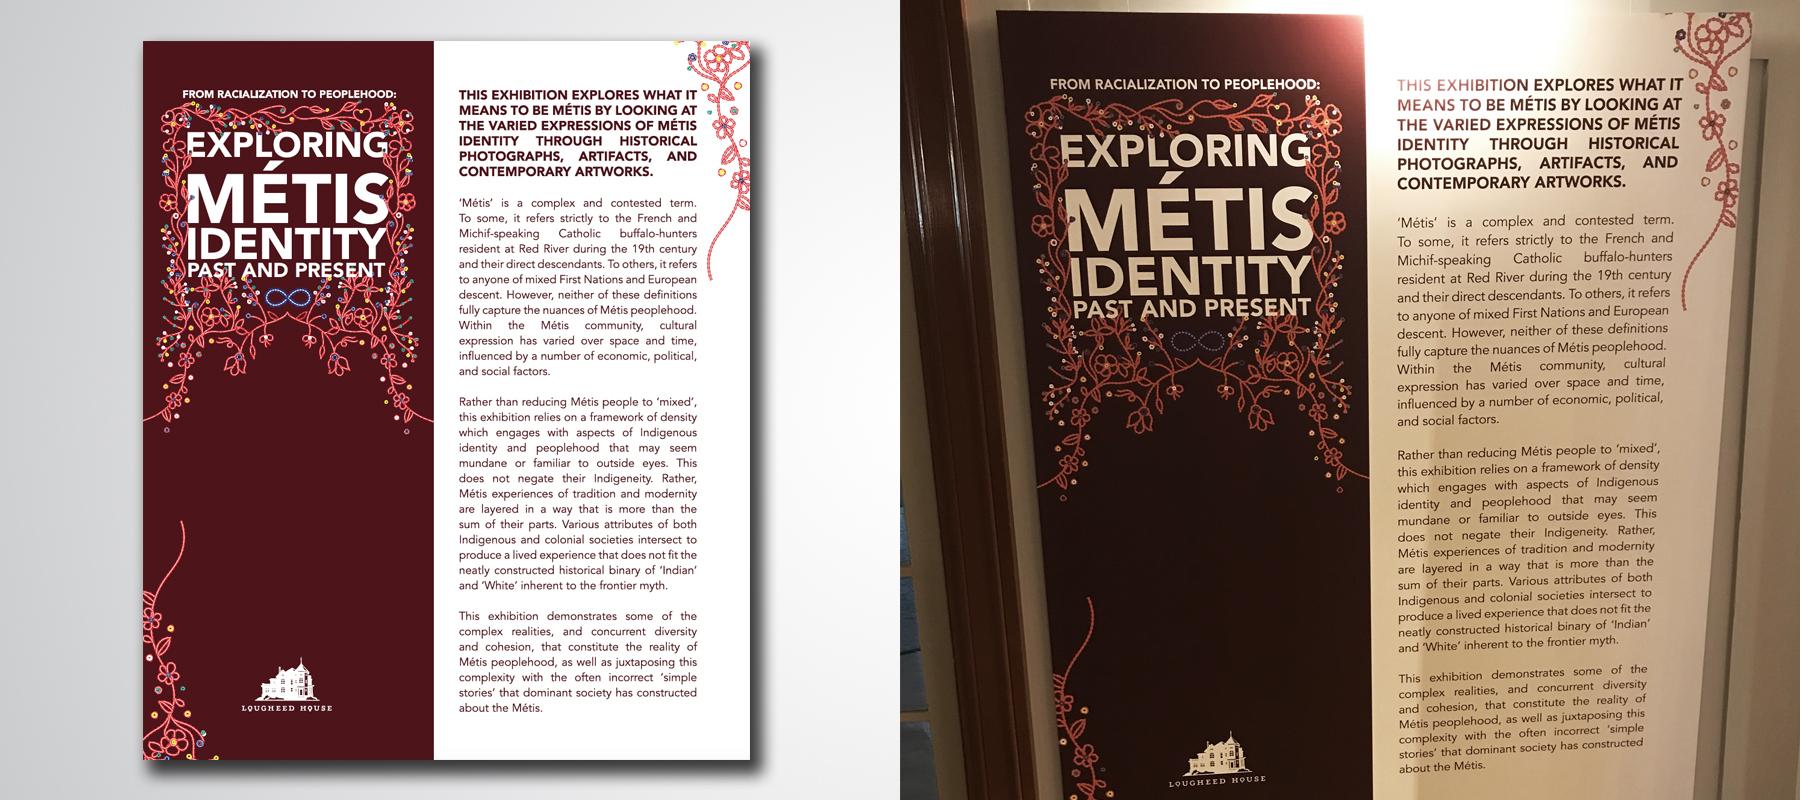 Lougheed House | Exploring Métis Identity